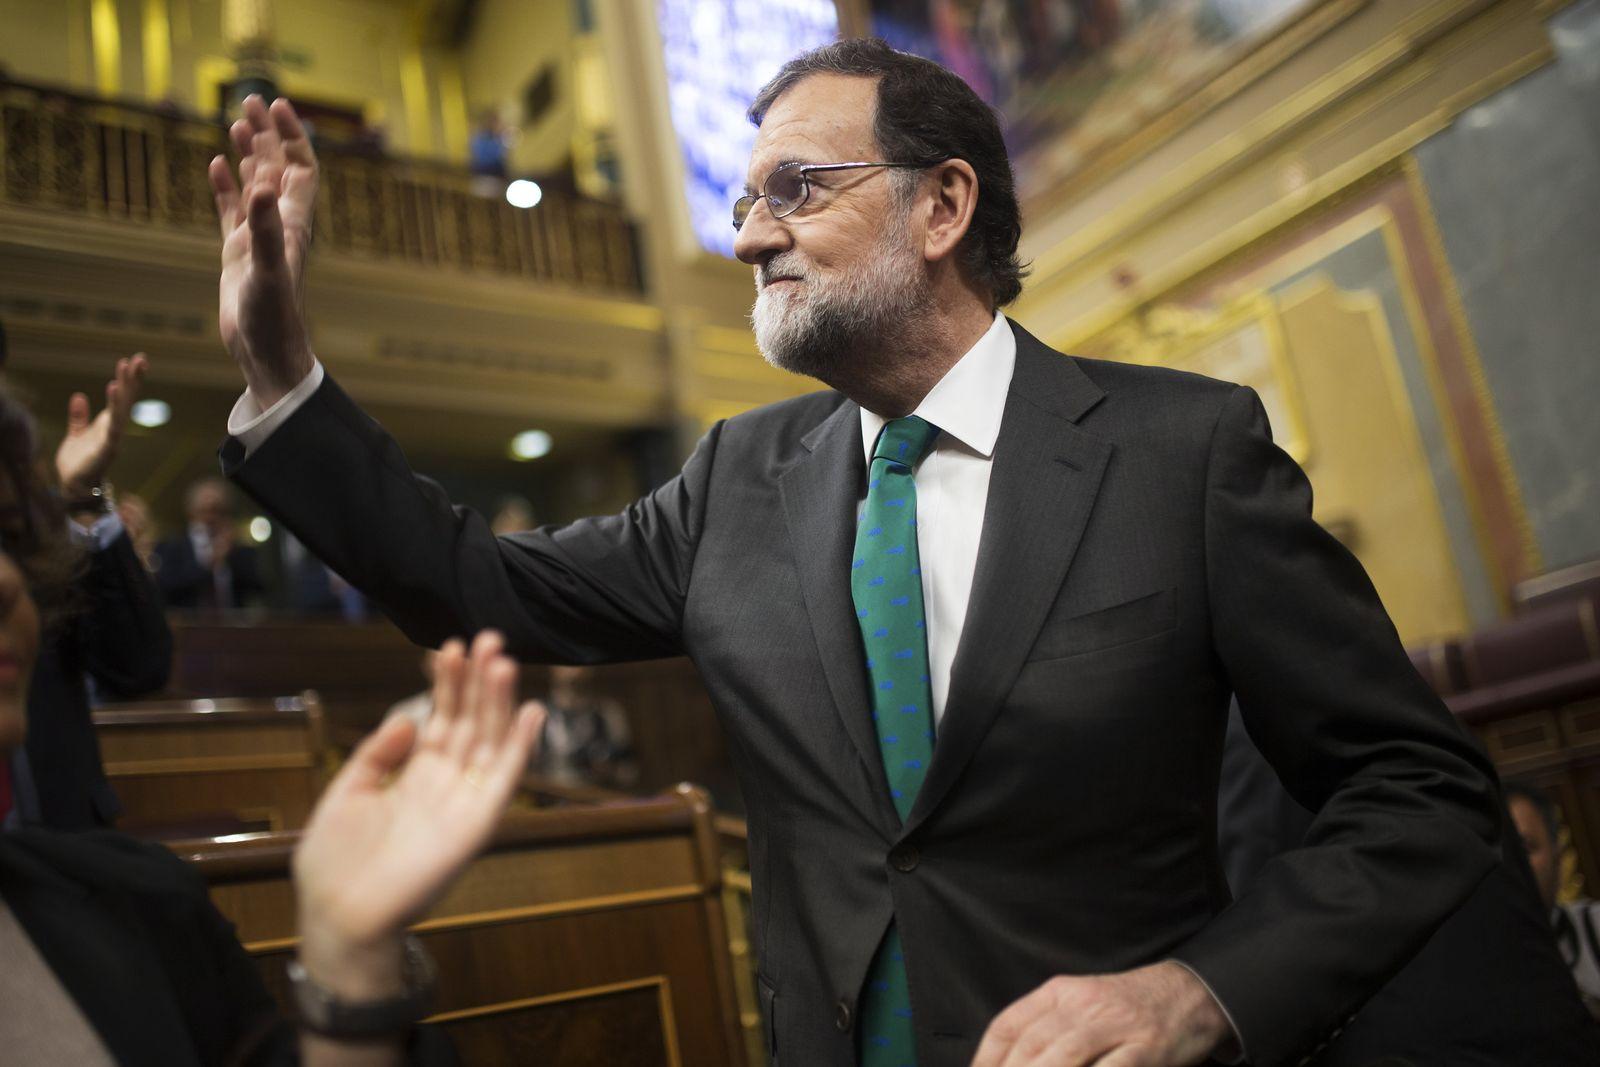 Misstrauensantrag gegen spanischen Ministerpräsidenten